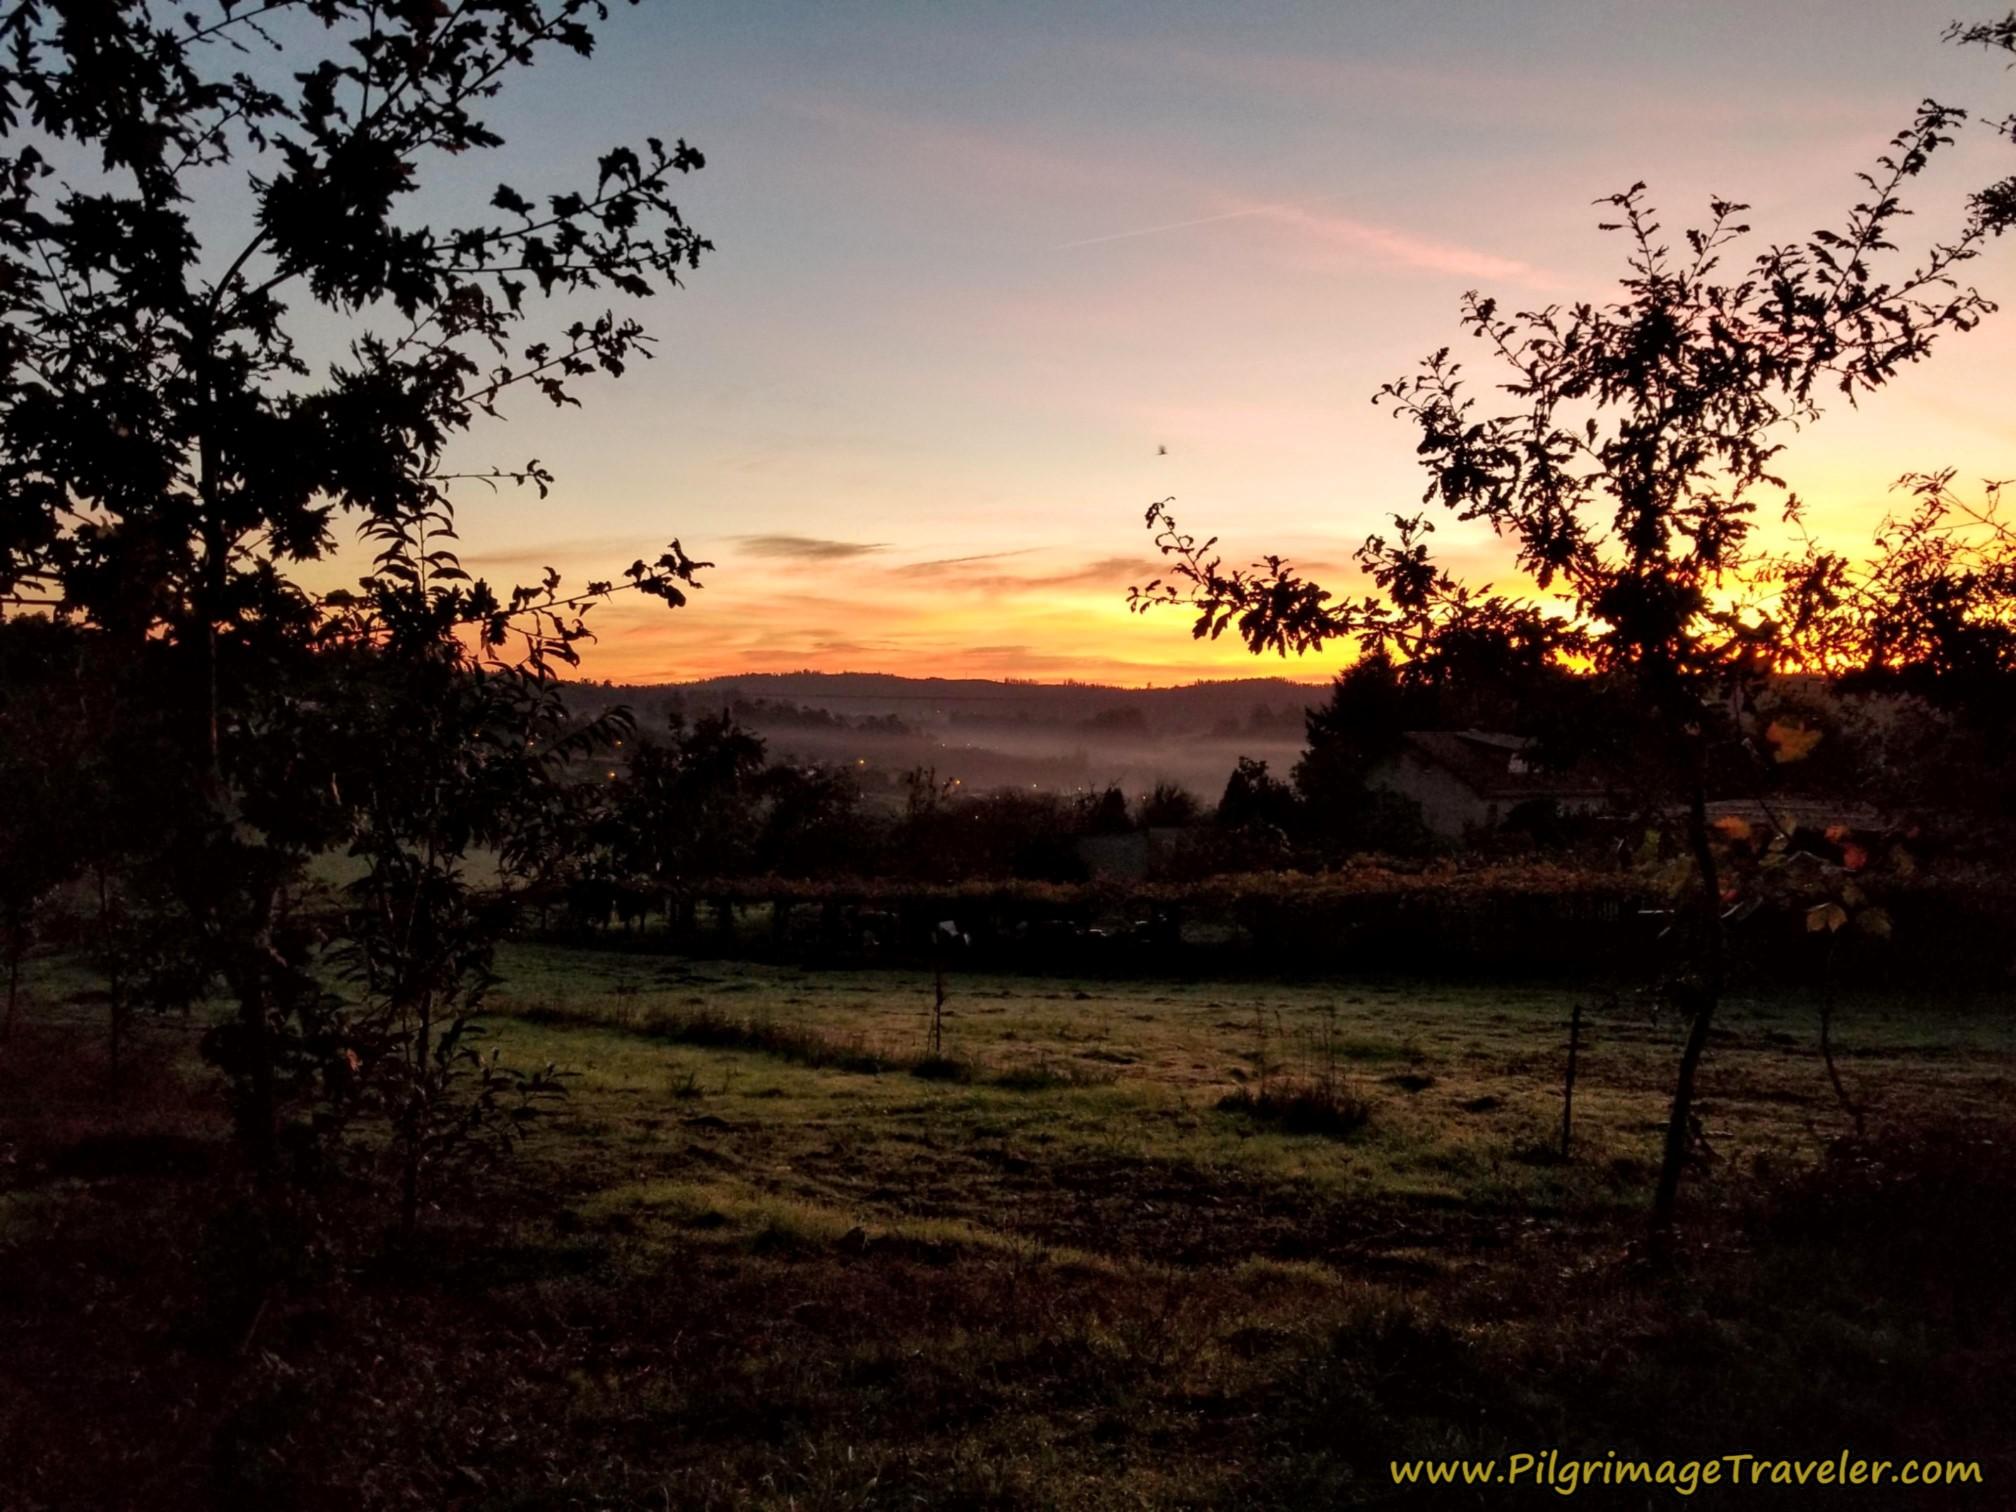 Sunrise Over Gándaraon on the Camino Sanabrés from A Susana to Santiago de Compostela